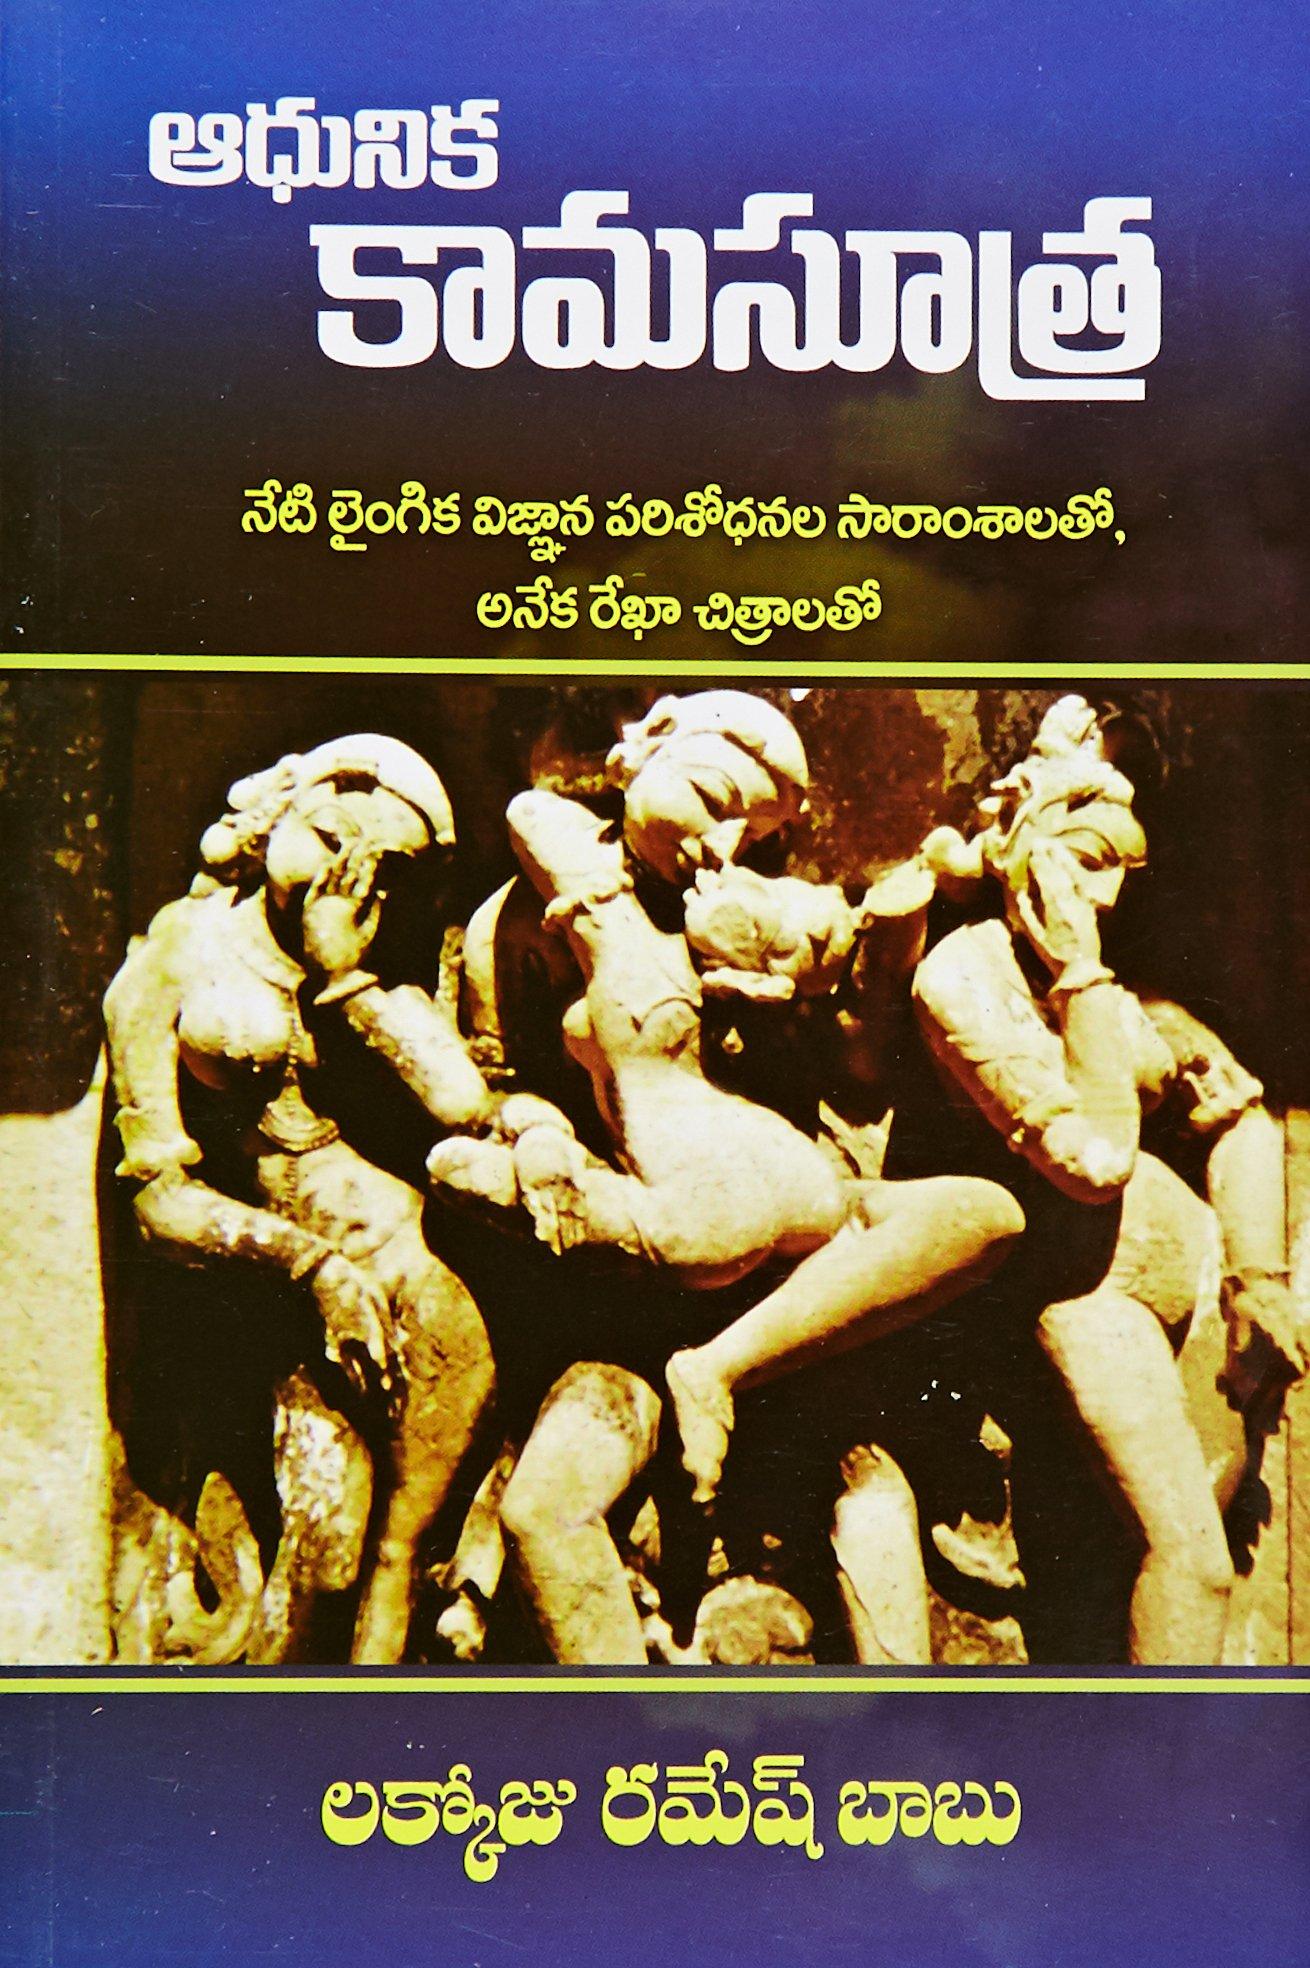 Pdf pictures book kamasutra telugu